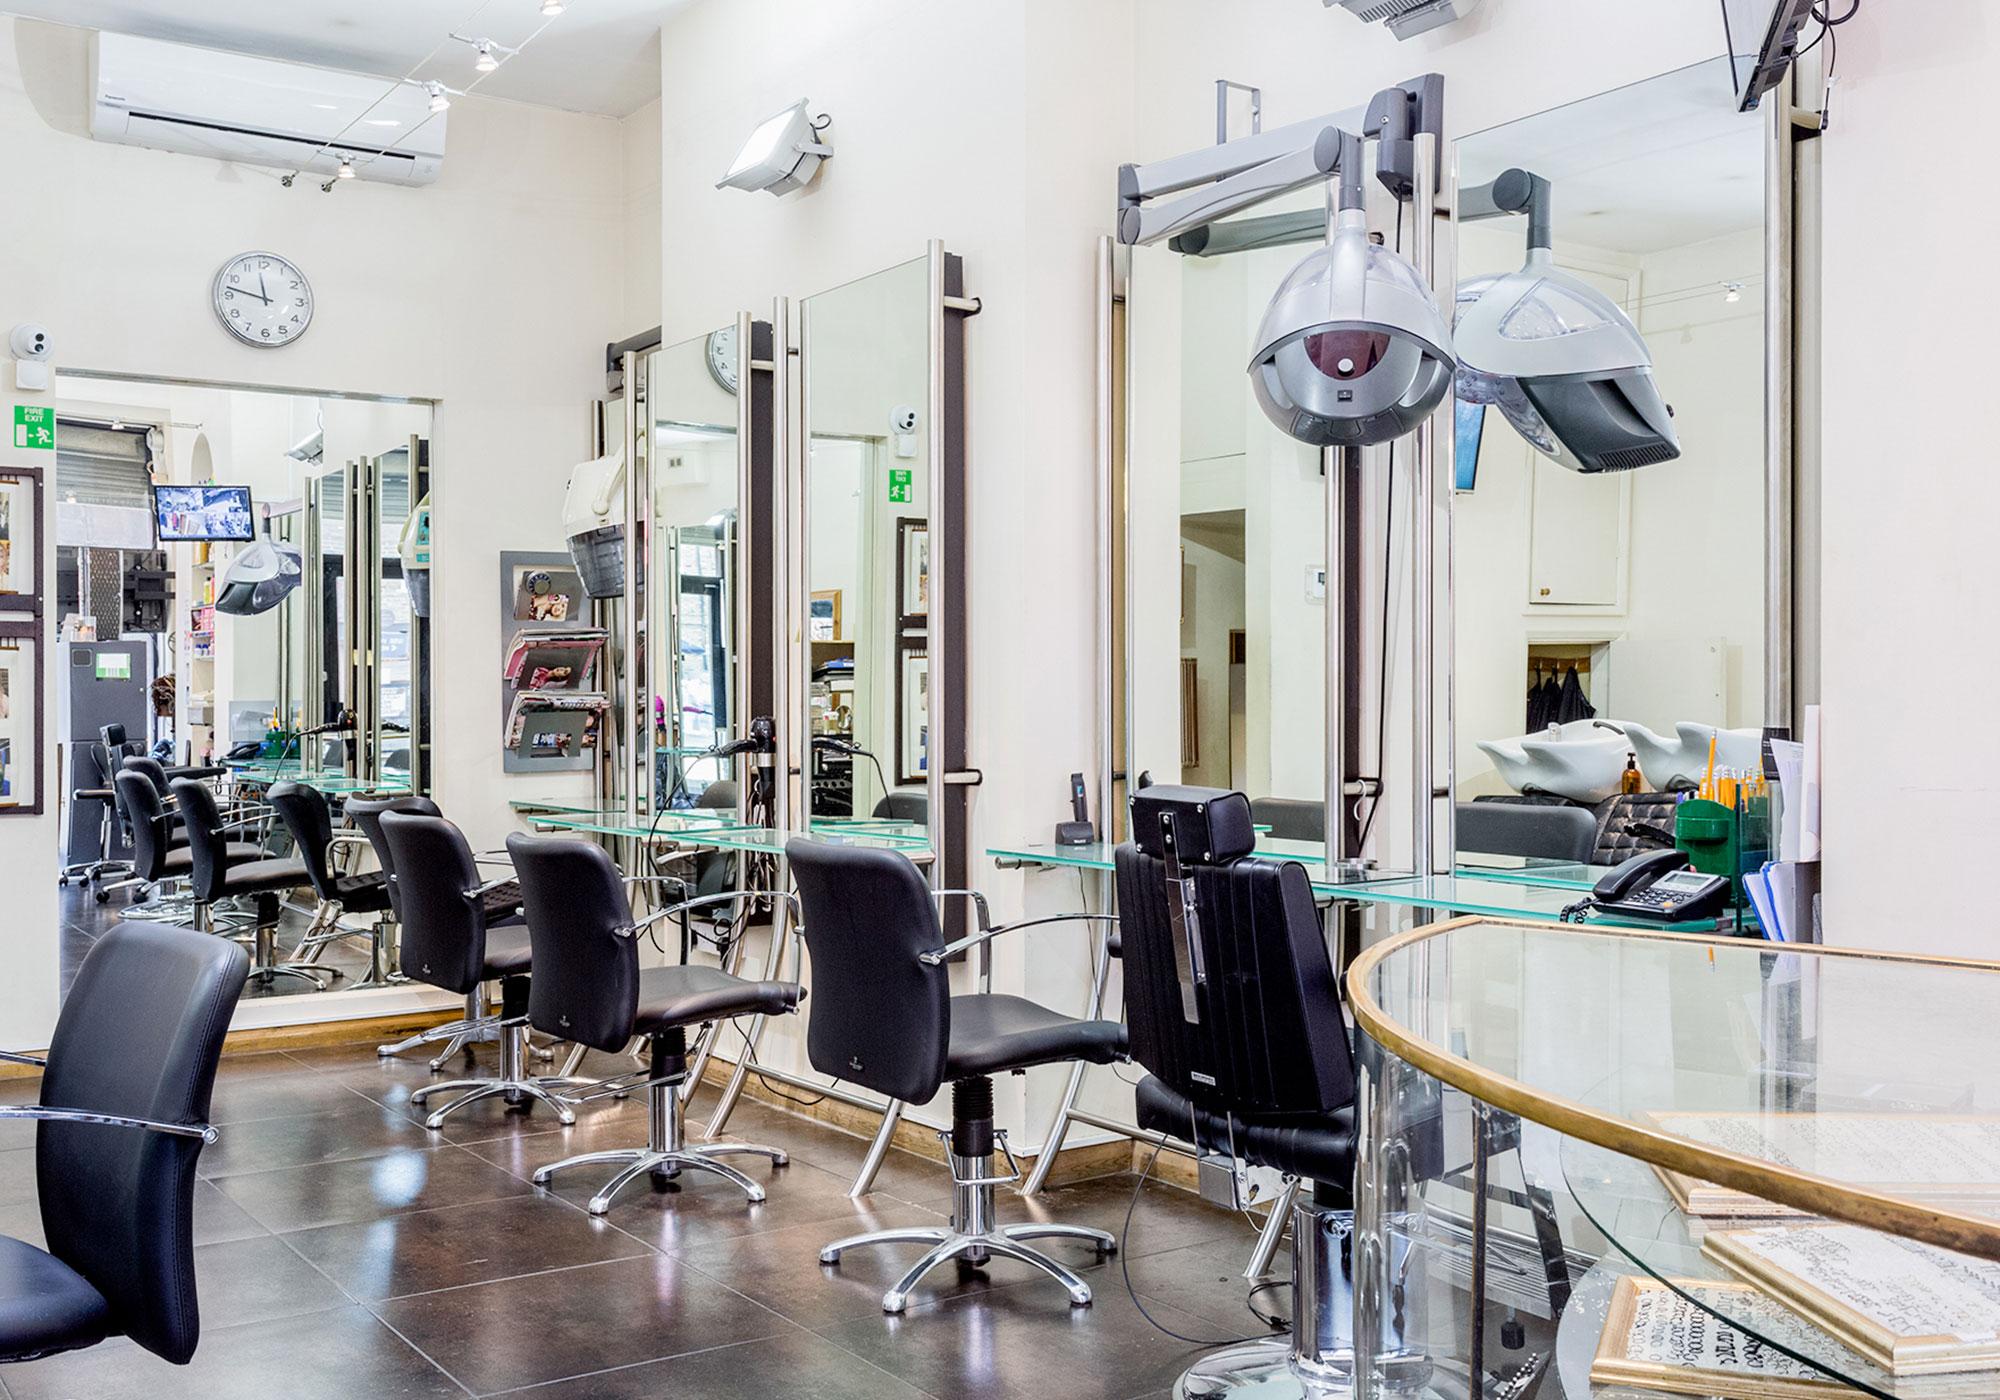 camden-locks-hair-studio-stylist-chairs